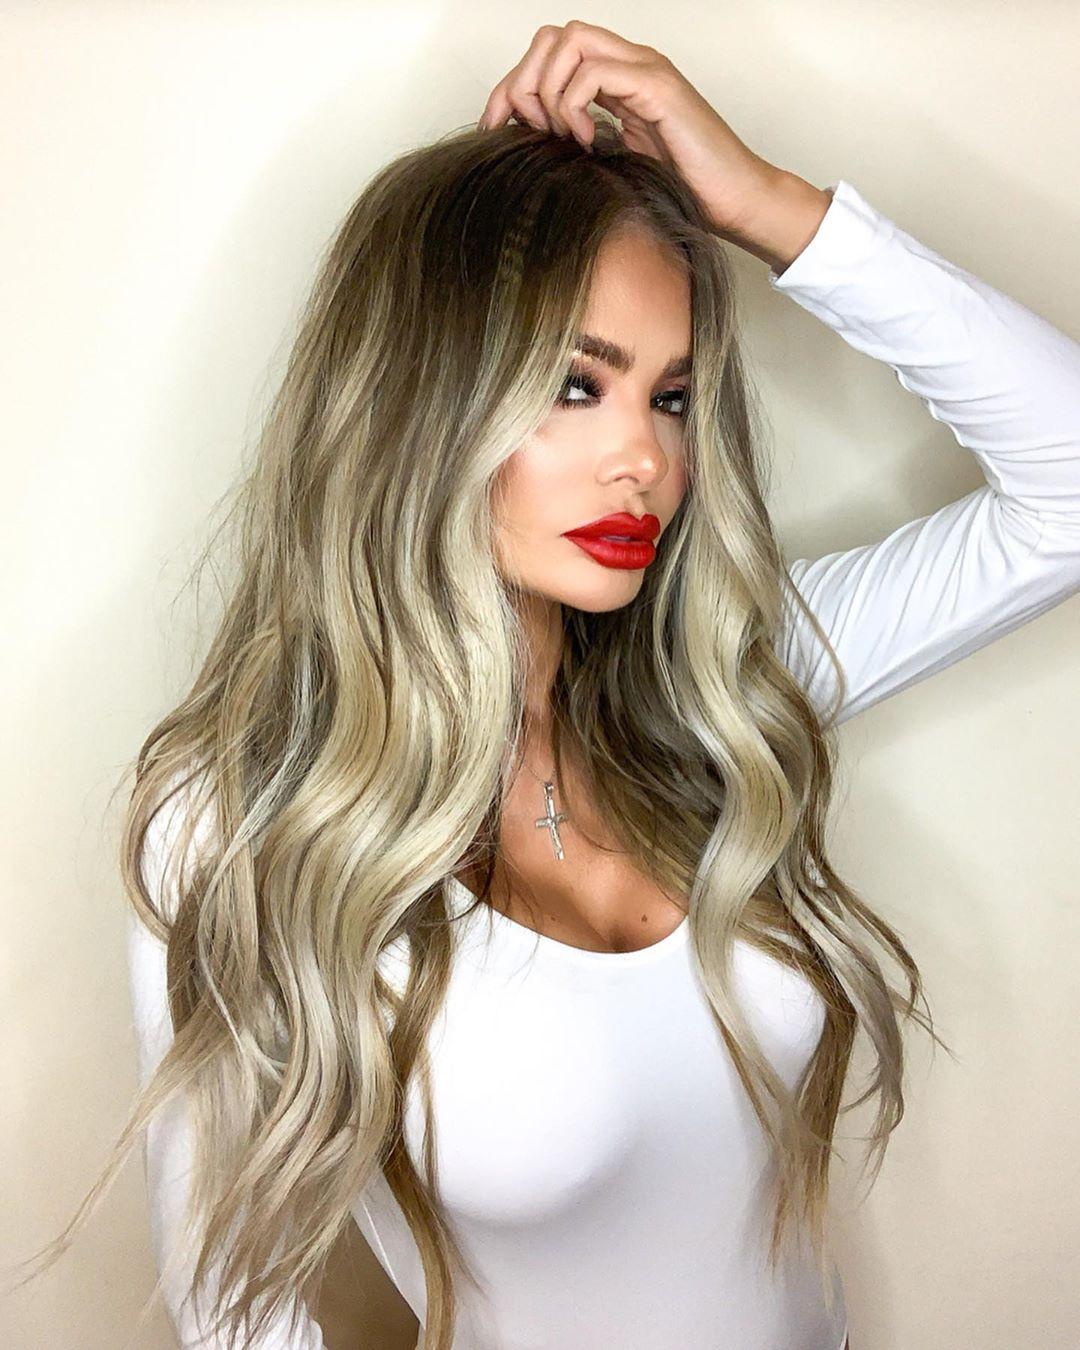 Chloe-Sims-Wallpapers-Insta-Fit-Bio-4